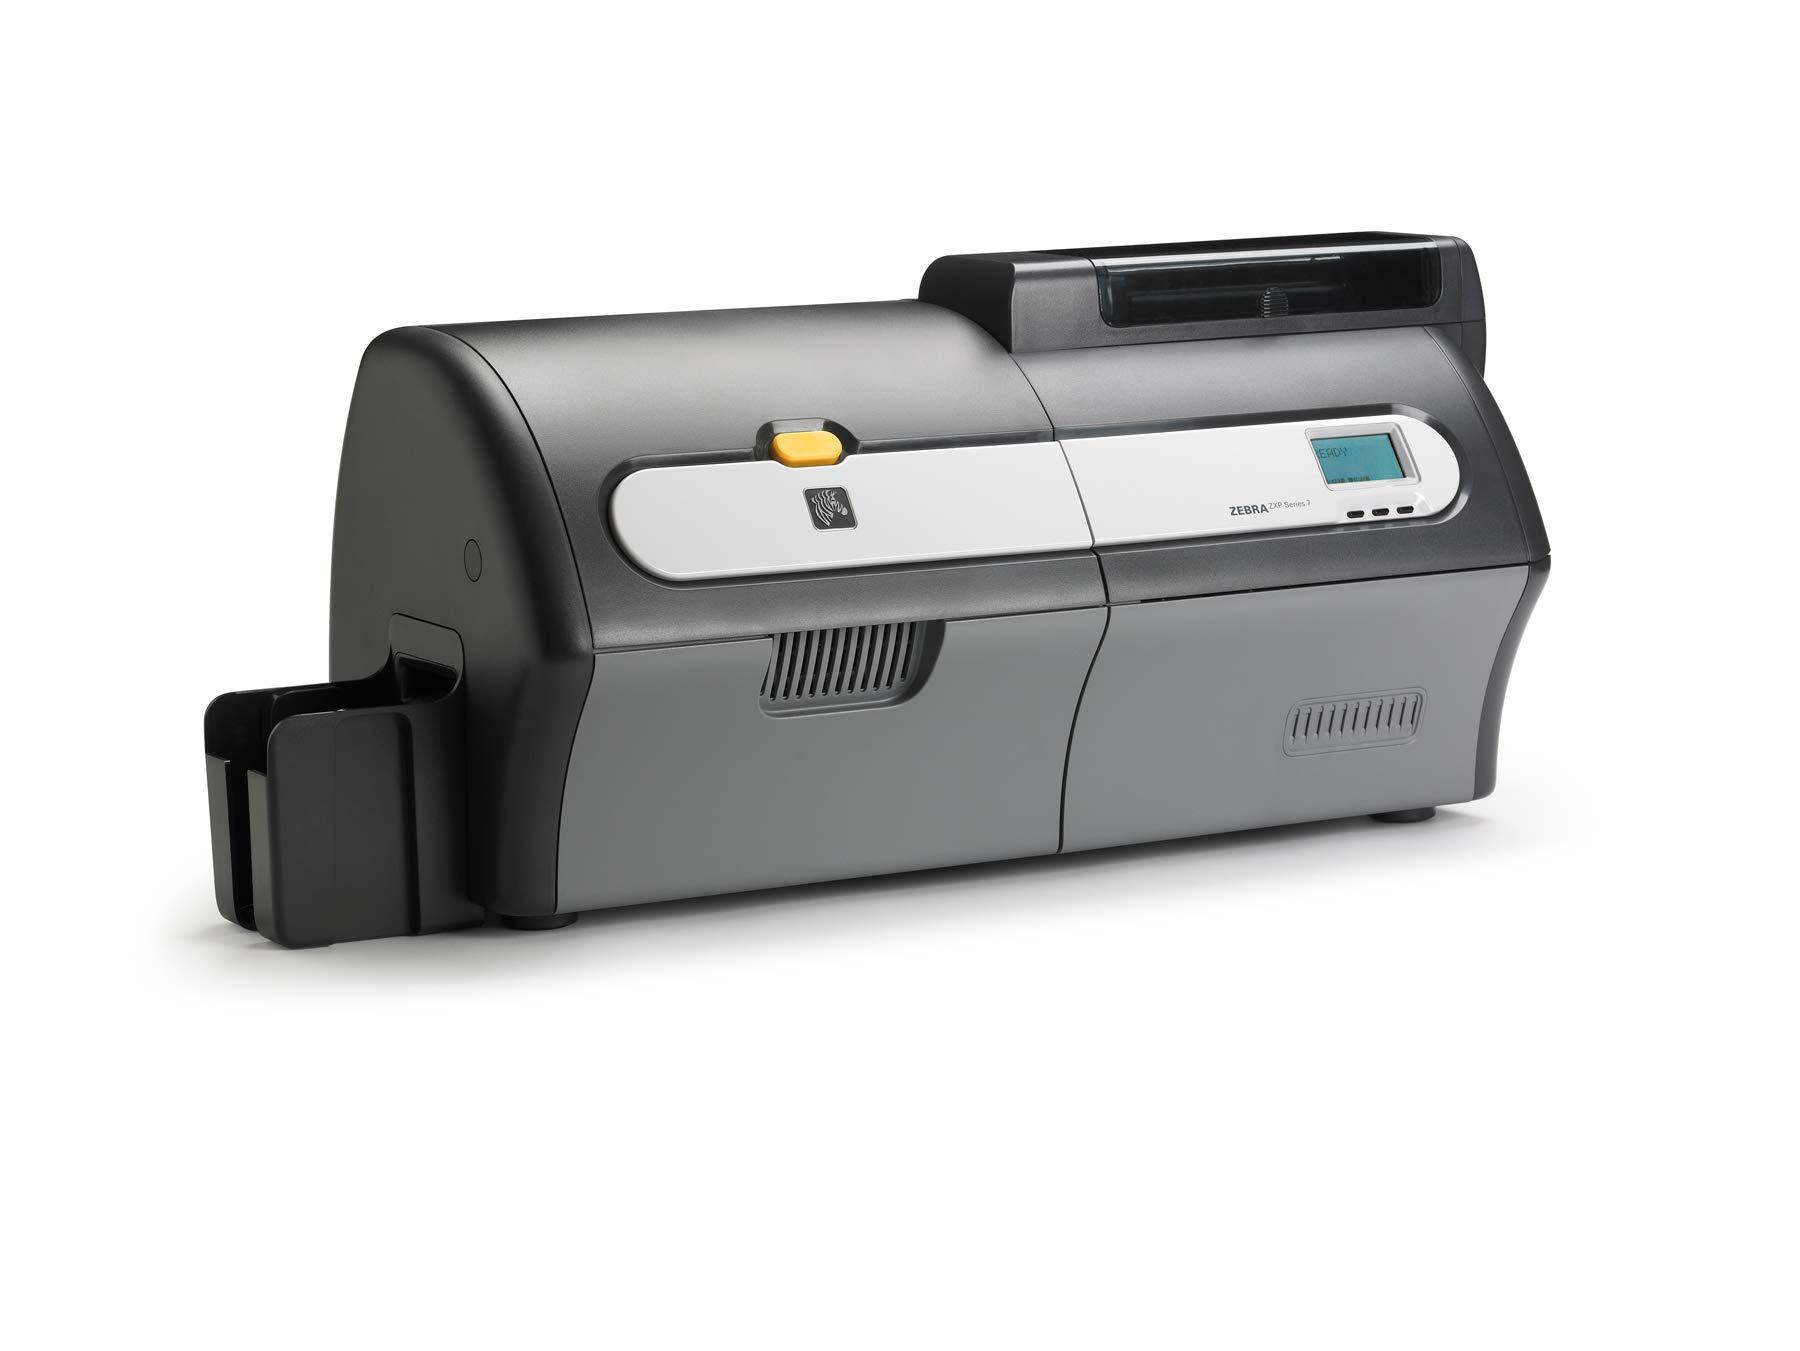 Zebra ZXP Series 7 Single-Side ID Card Printer Package (Z71-000C0000US00) by Card Imaging (Image #2)